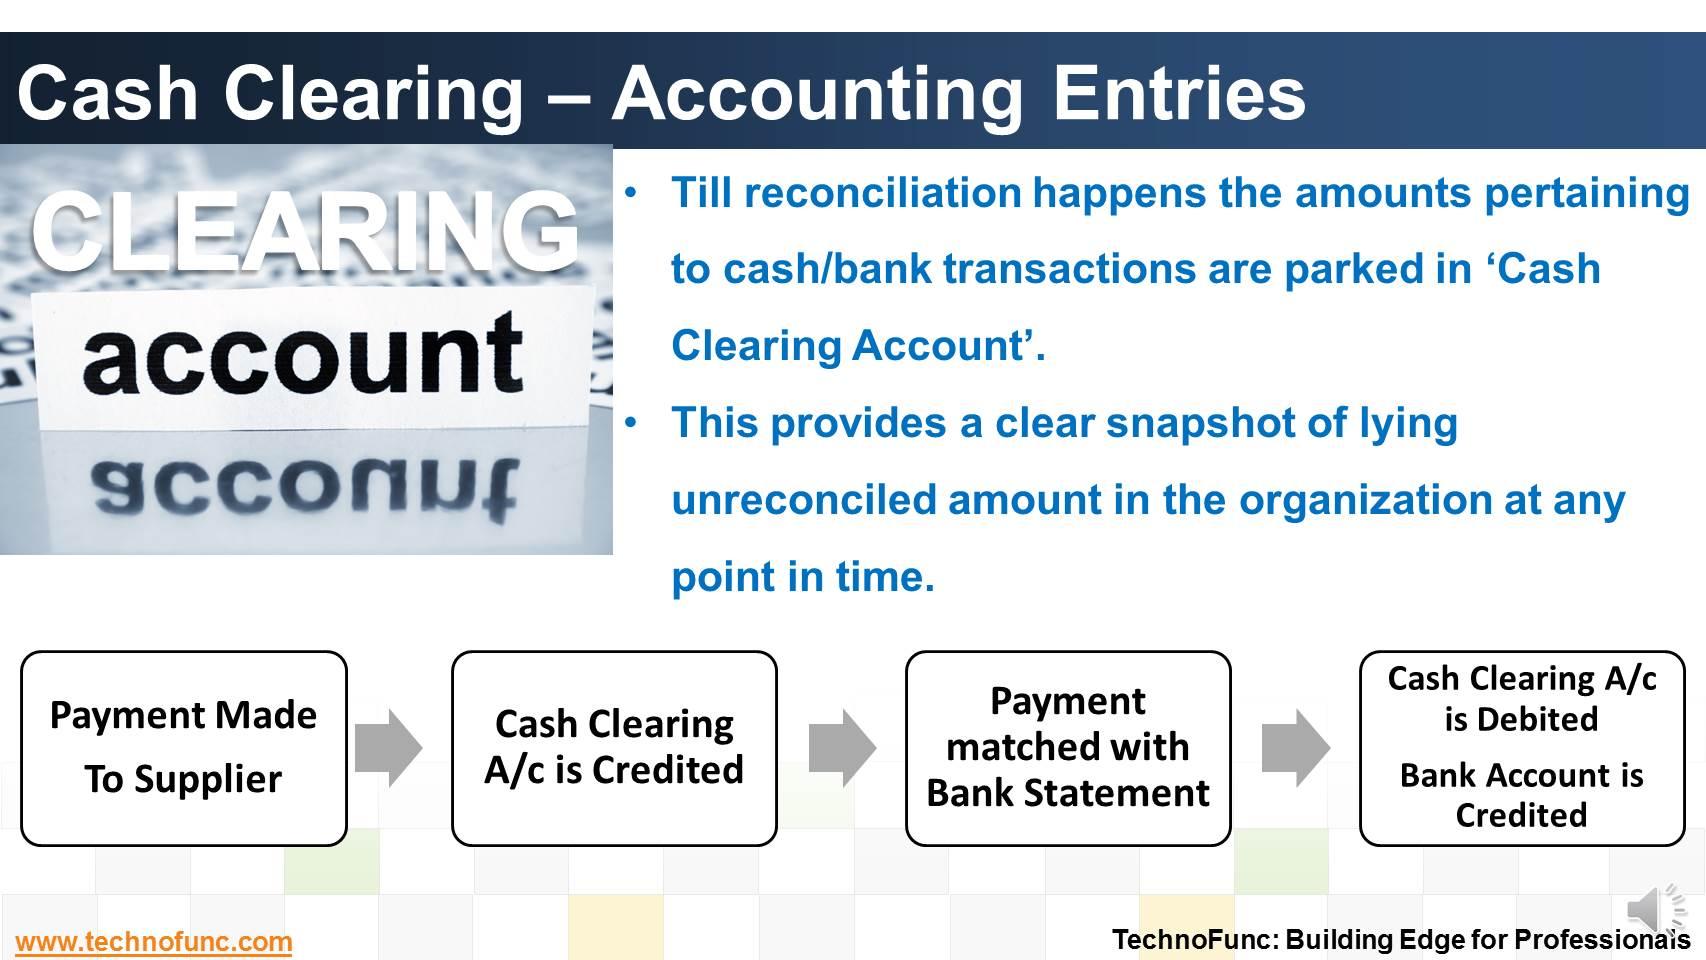 Technofunc Cash Clearing Accounting Entries